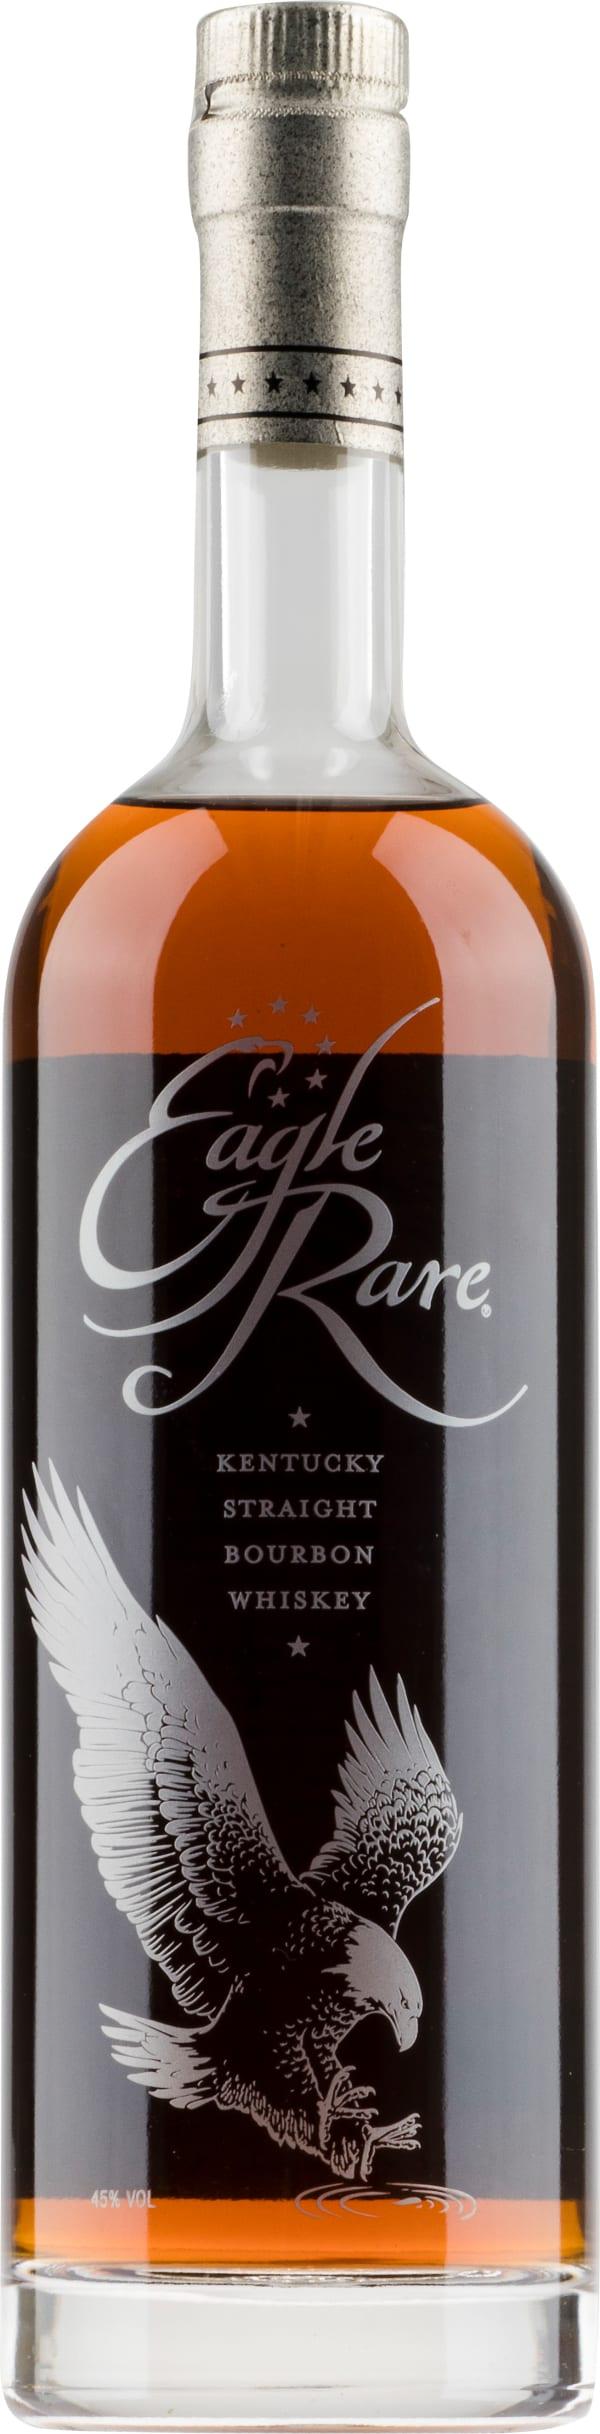 Eagle Rare Kentucky Straight Bourbon Whiskey